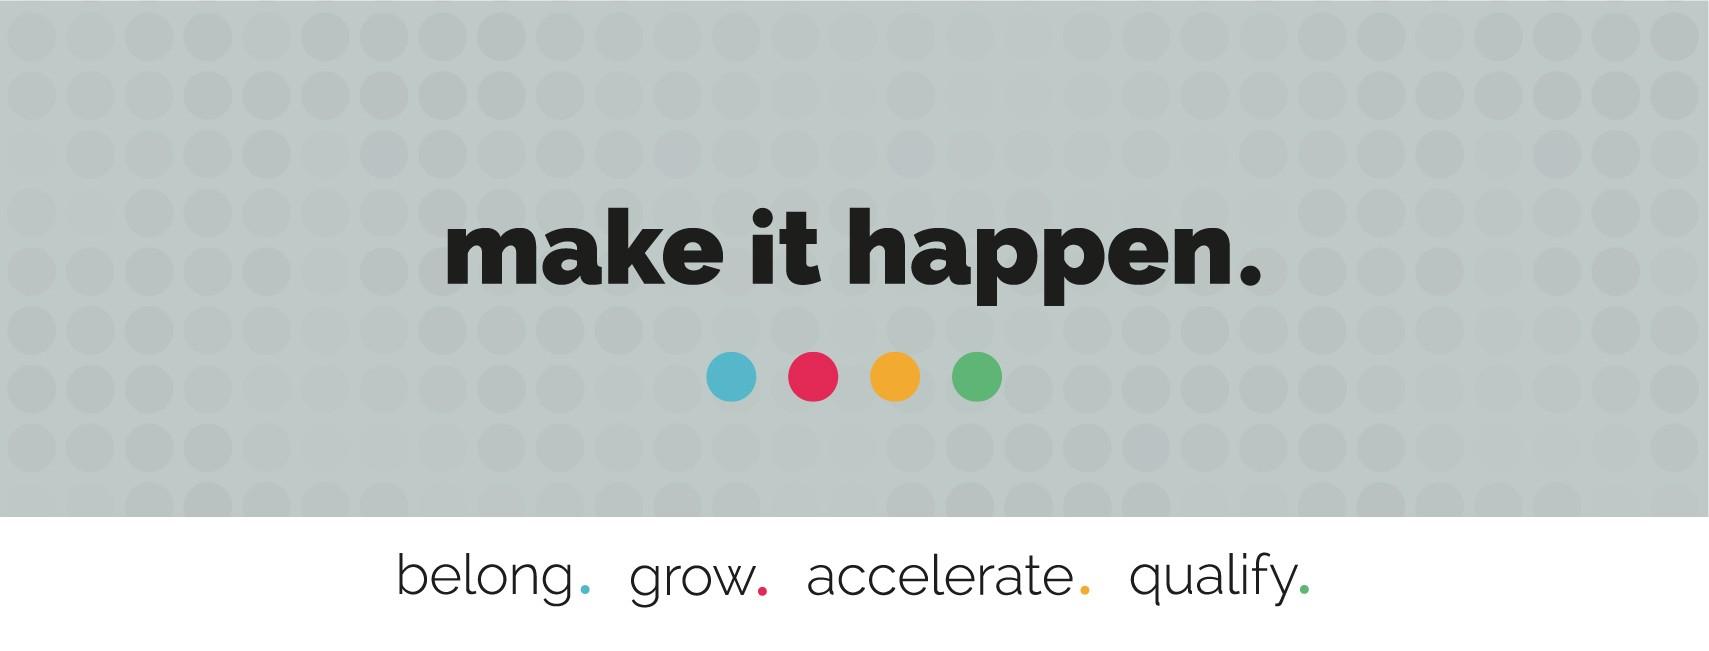 Make It Happen >> Make It Happen Linkedin